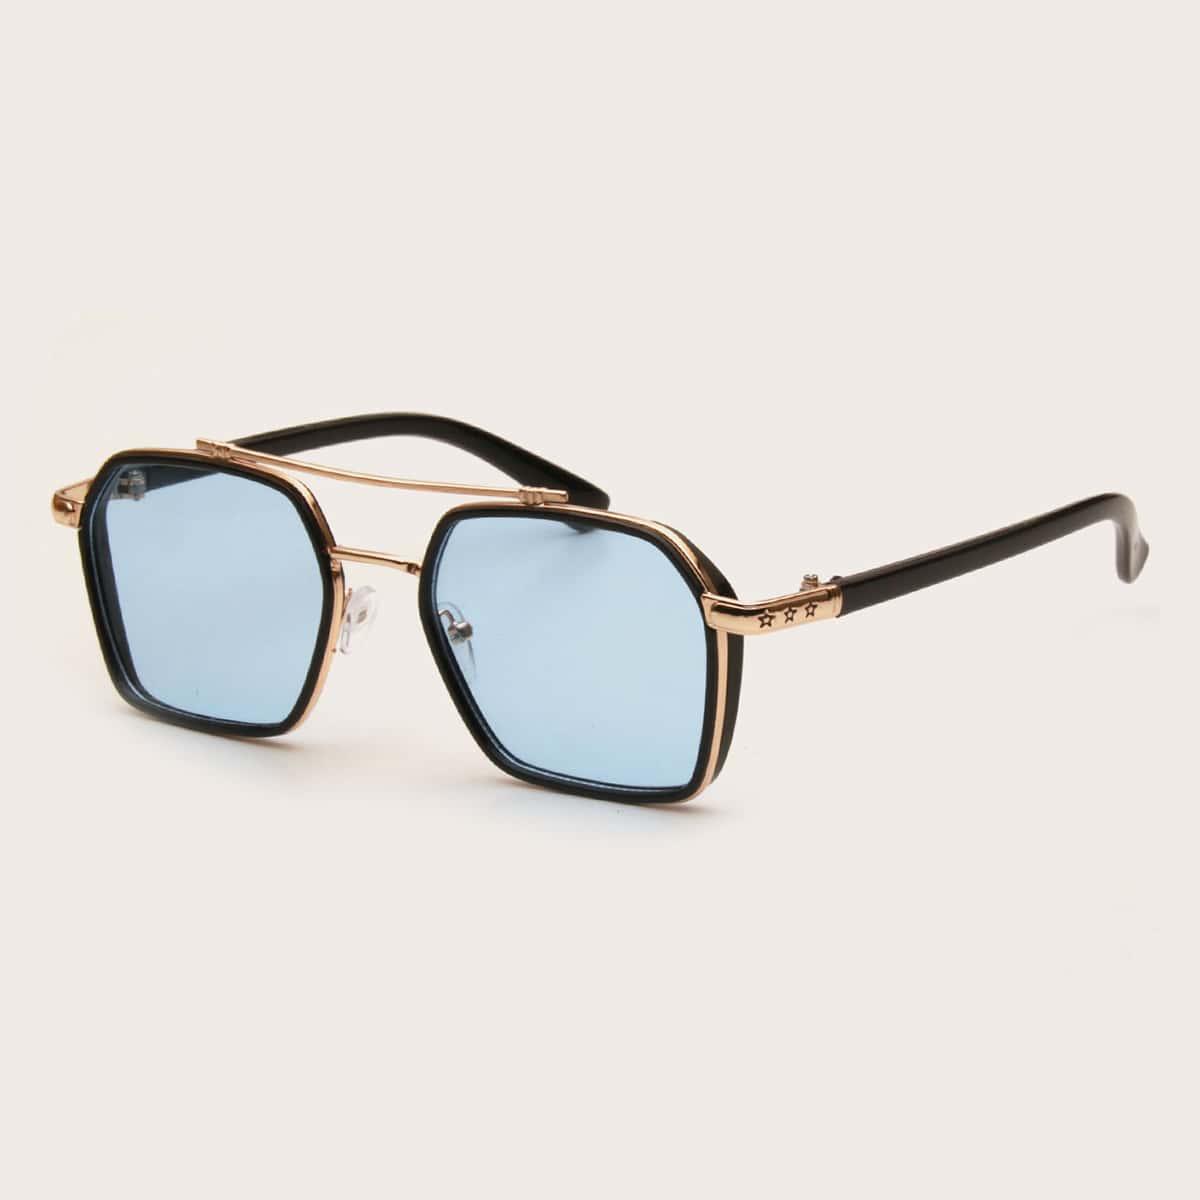 SHEIN Heren Top Bar zonnebril